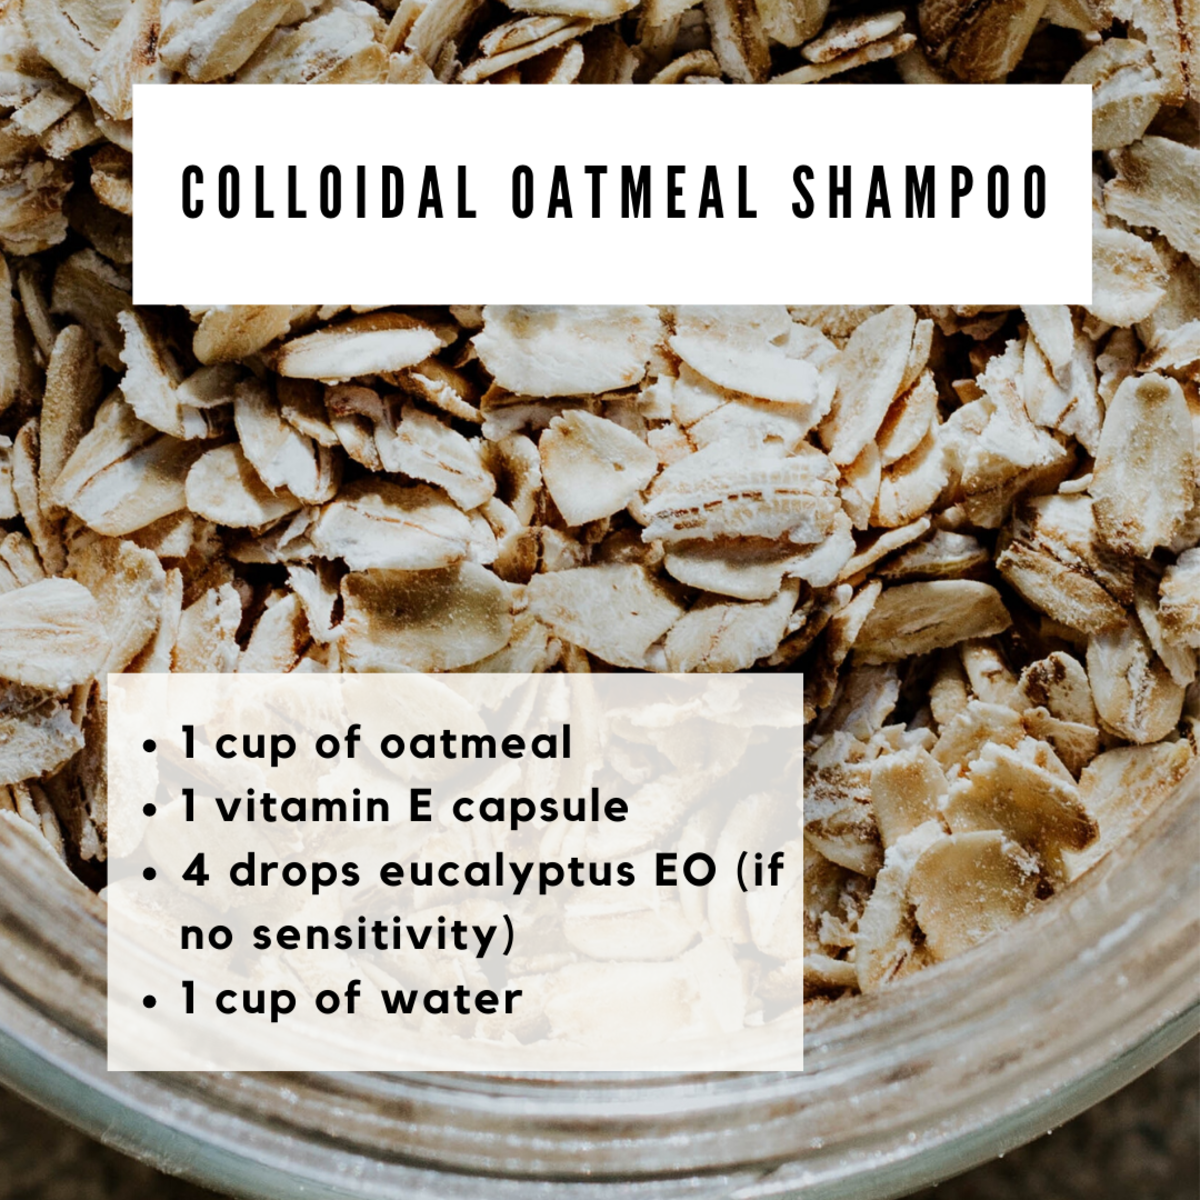 How to Make a Colloidal Oatmeal Shampoo for Your Dog